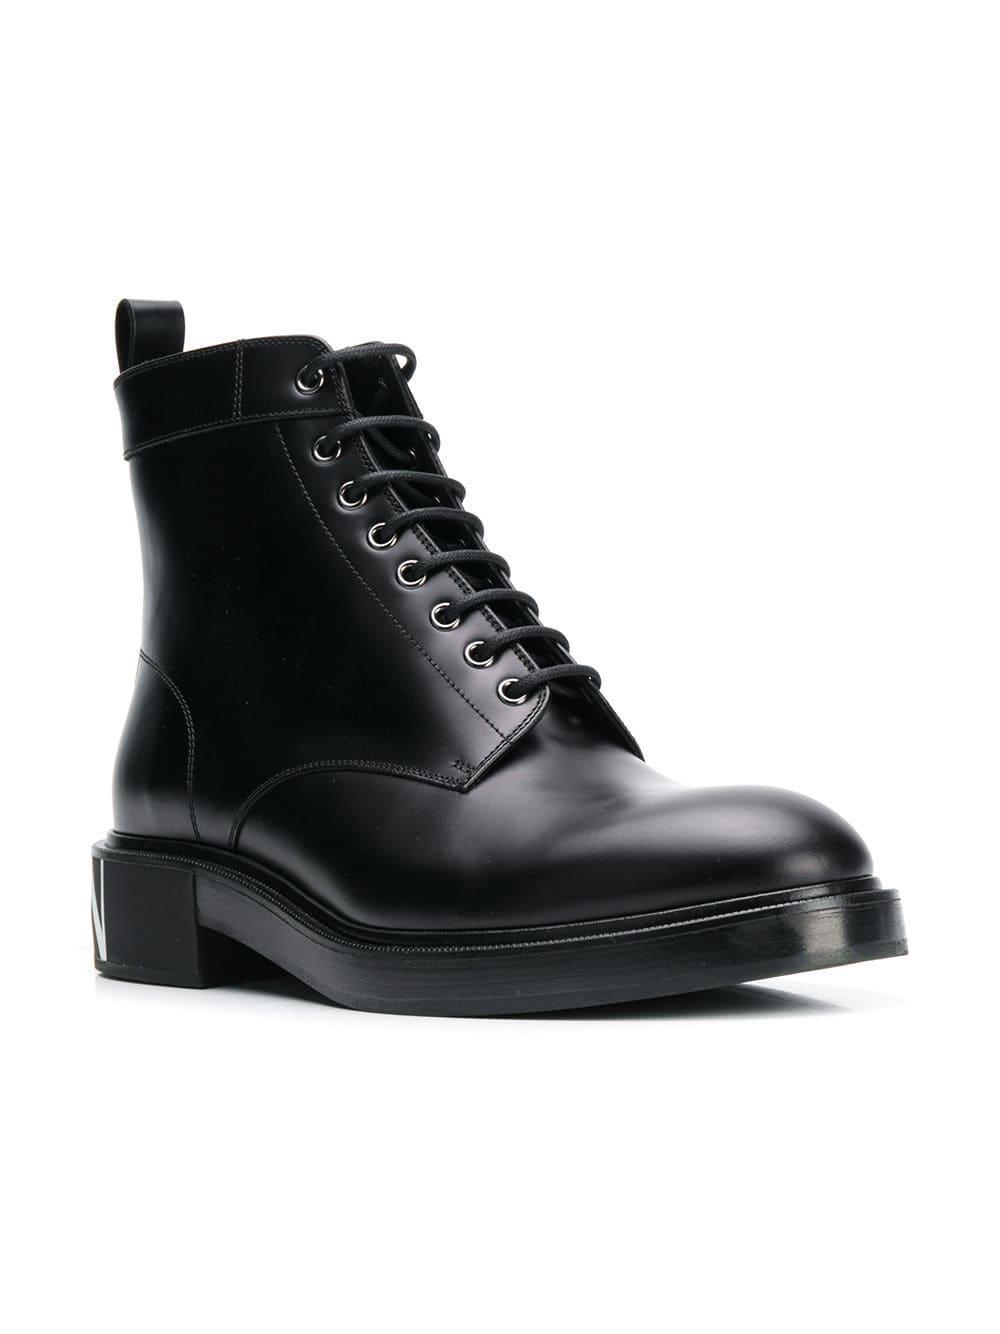 26fc17548c50fa Lyst - Valentino Garavani Vltn Combat Boots in Black for Men